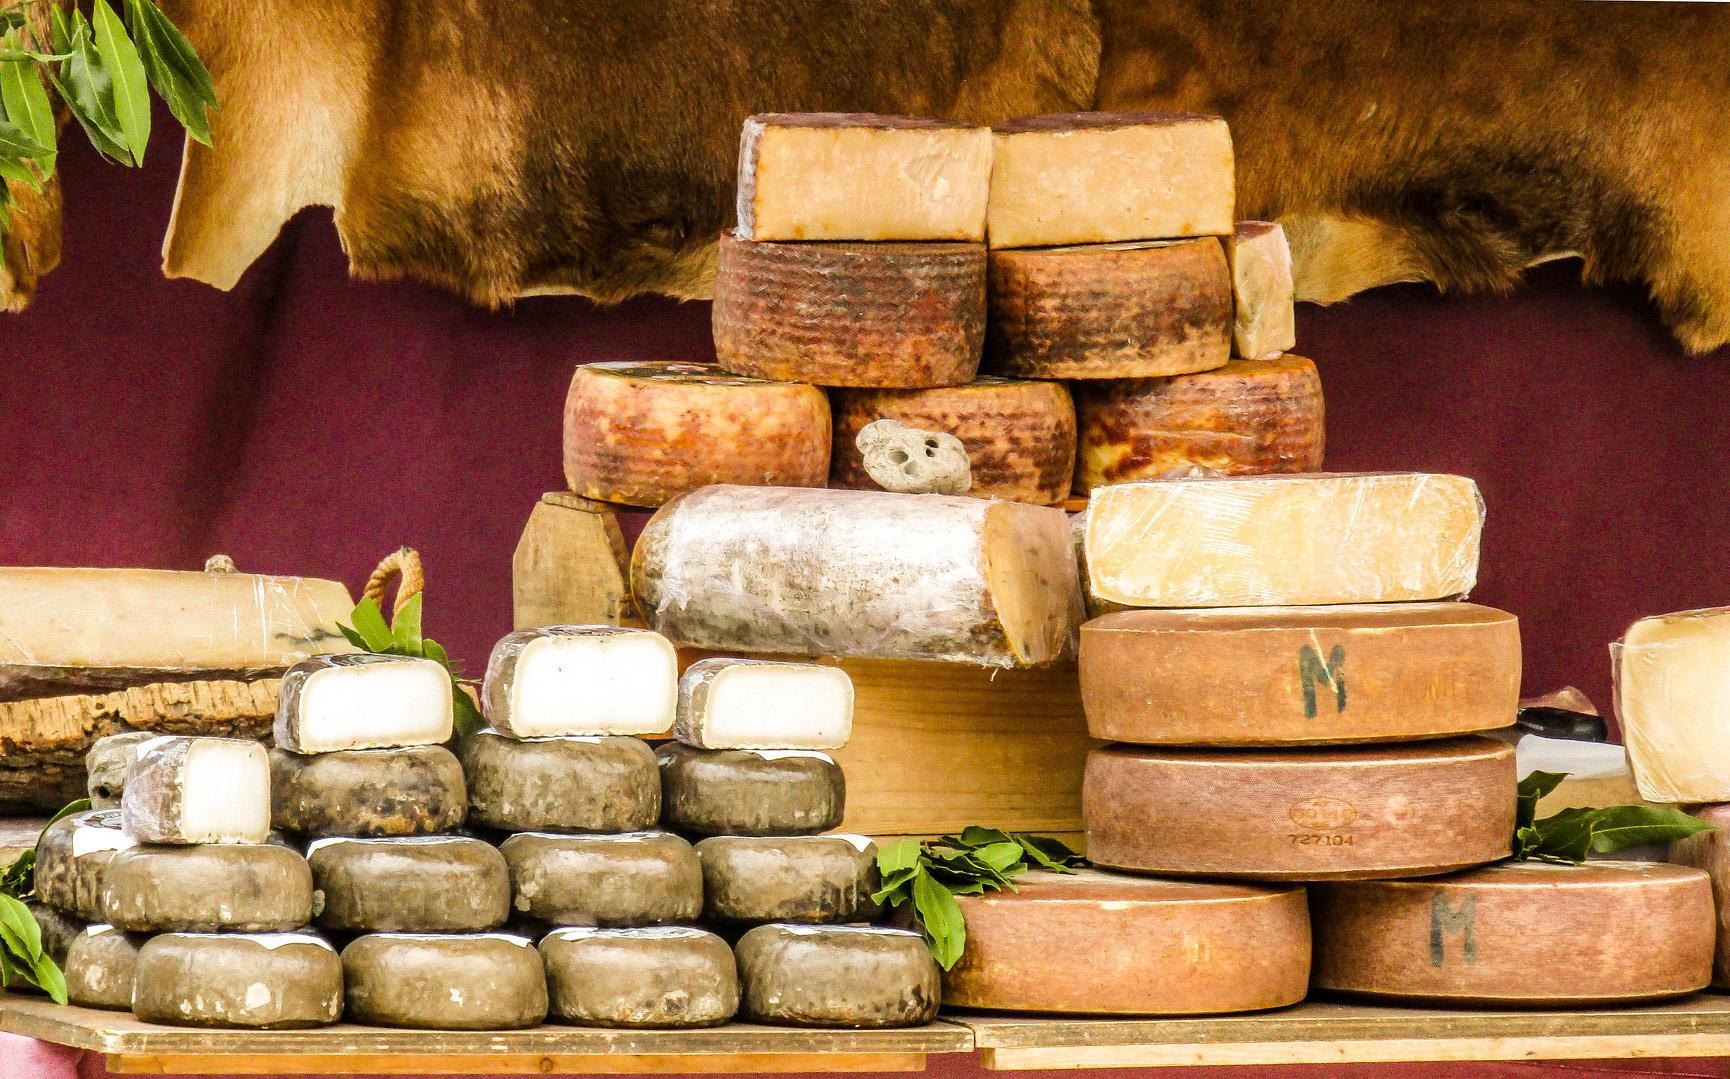 formaggio-capra-isole-eolie